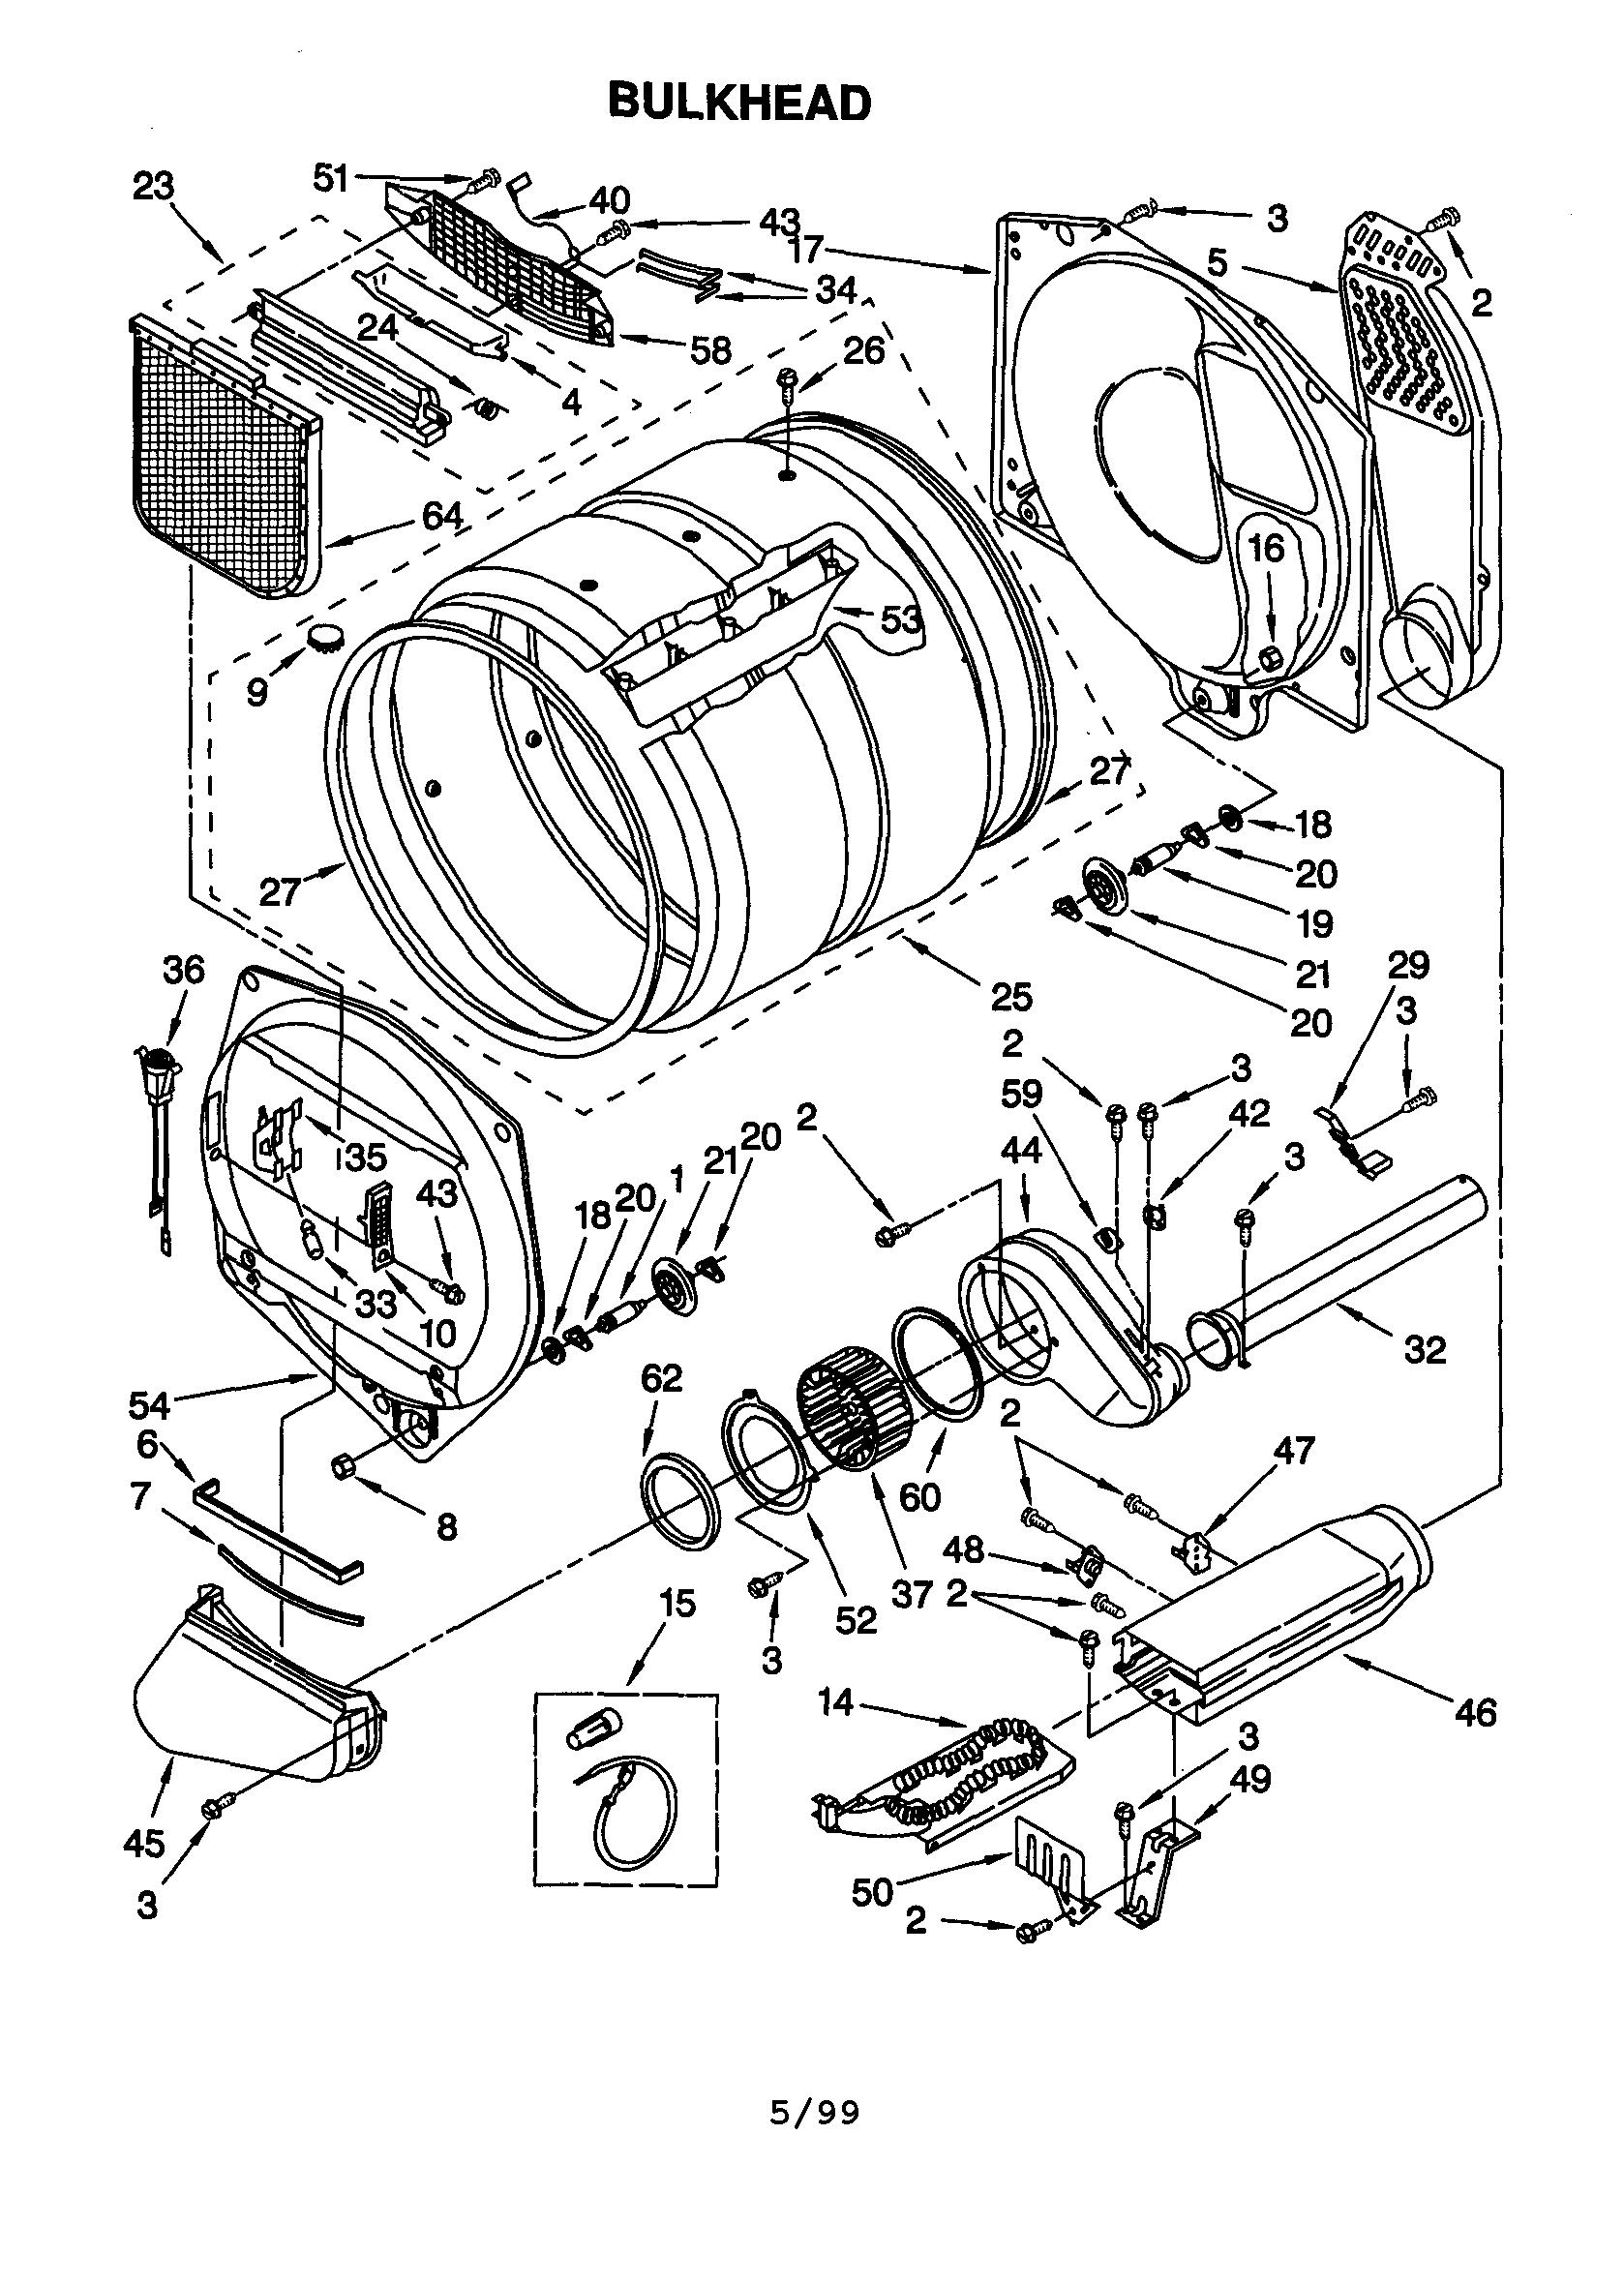 Kenmore Elite Dryer Parts Diagram : kenmore, elite, dryer, parts, diagram, Wiring, Diagram, Kenmore, Series, Dryer